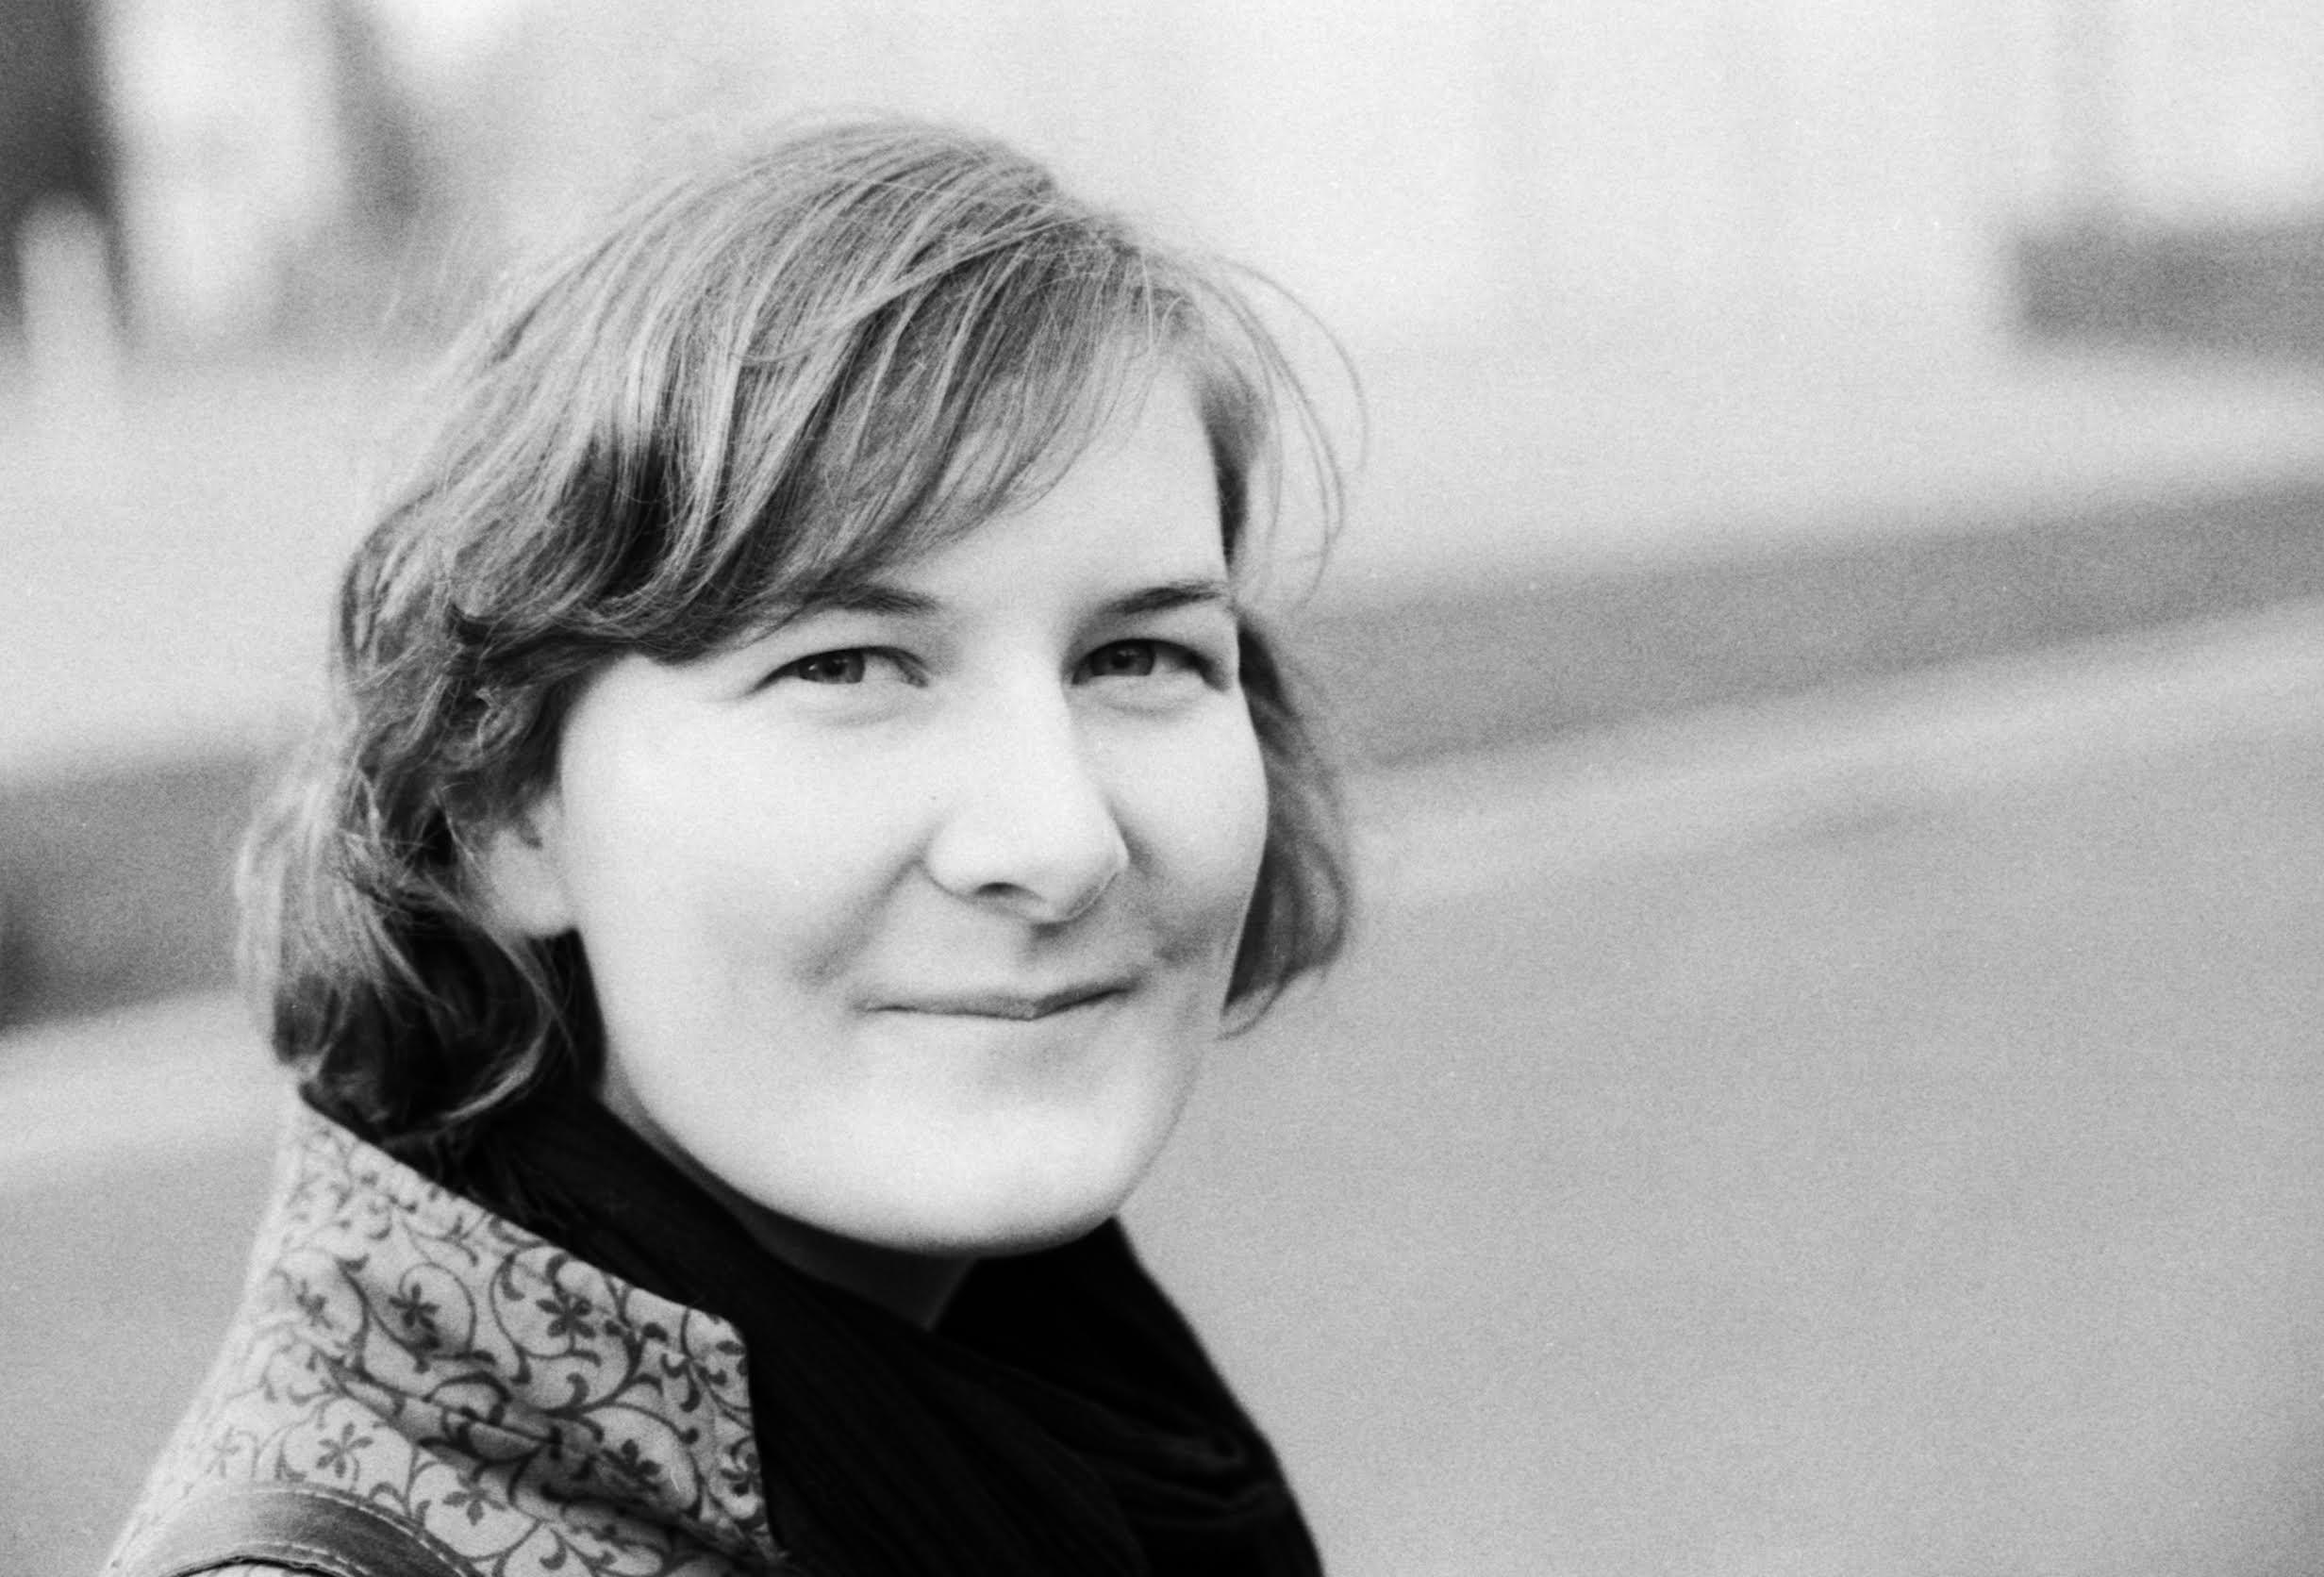 Prosjektdeltaker Jenny Berger Myhre. Foto: Emil Kraugerud